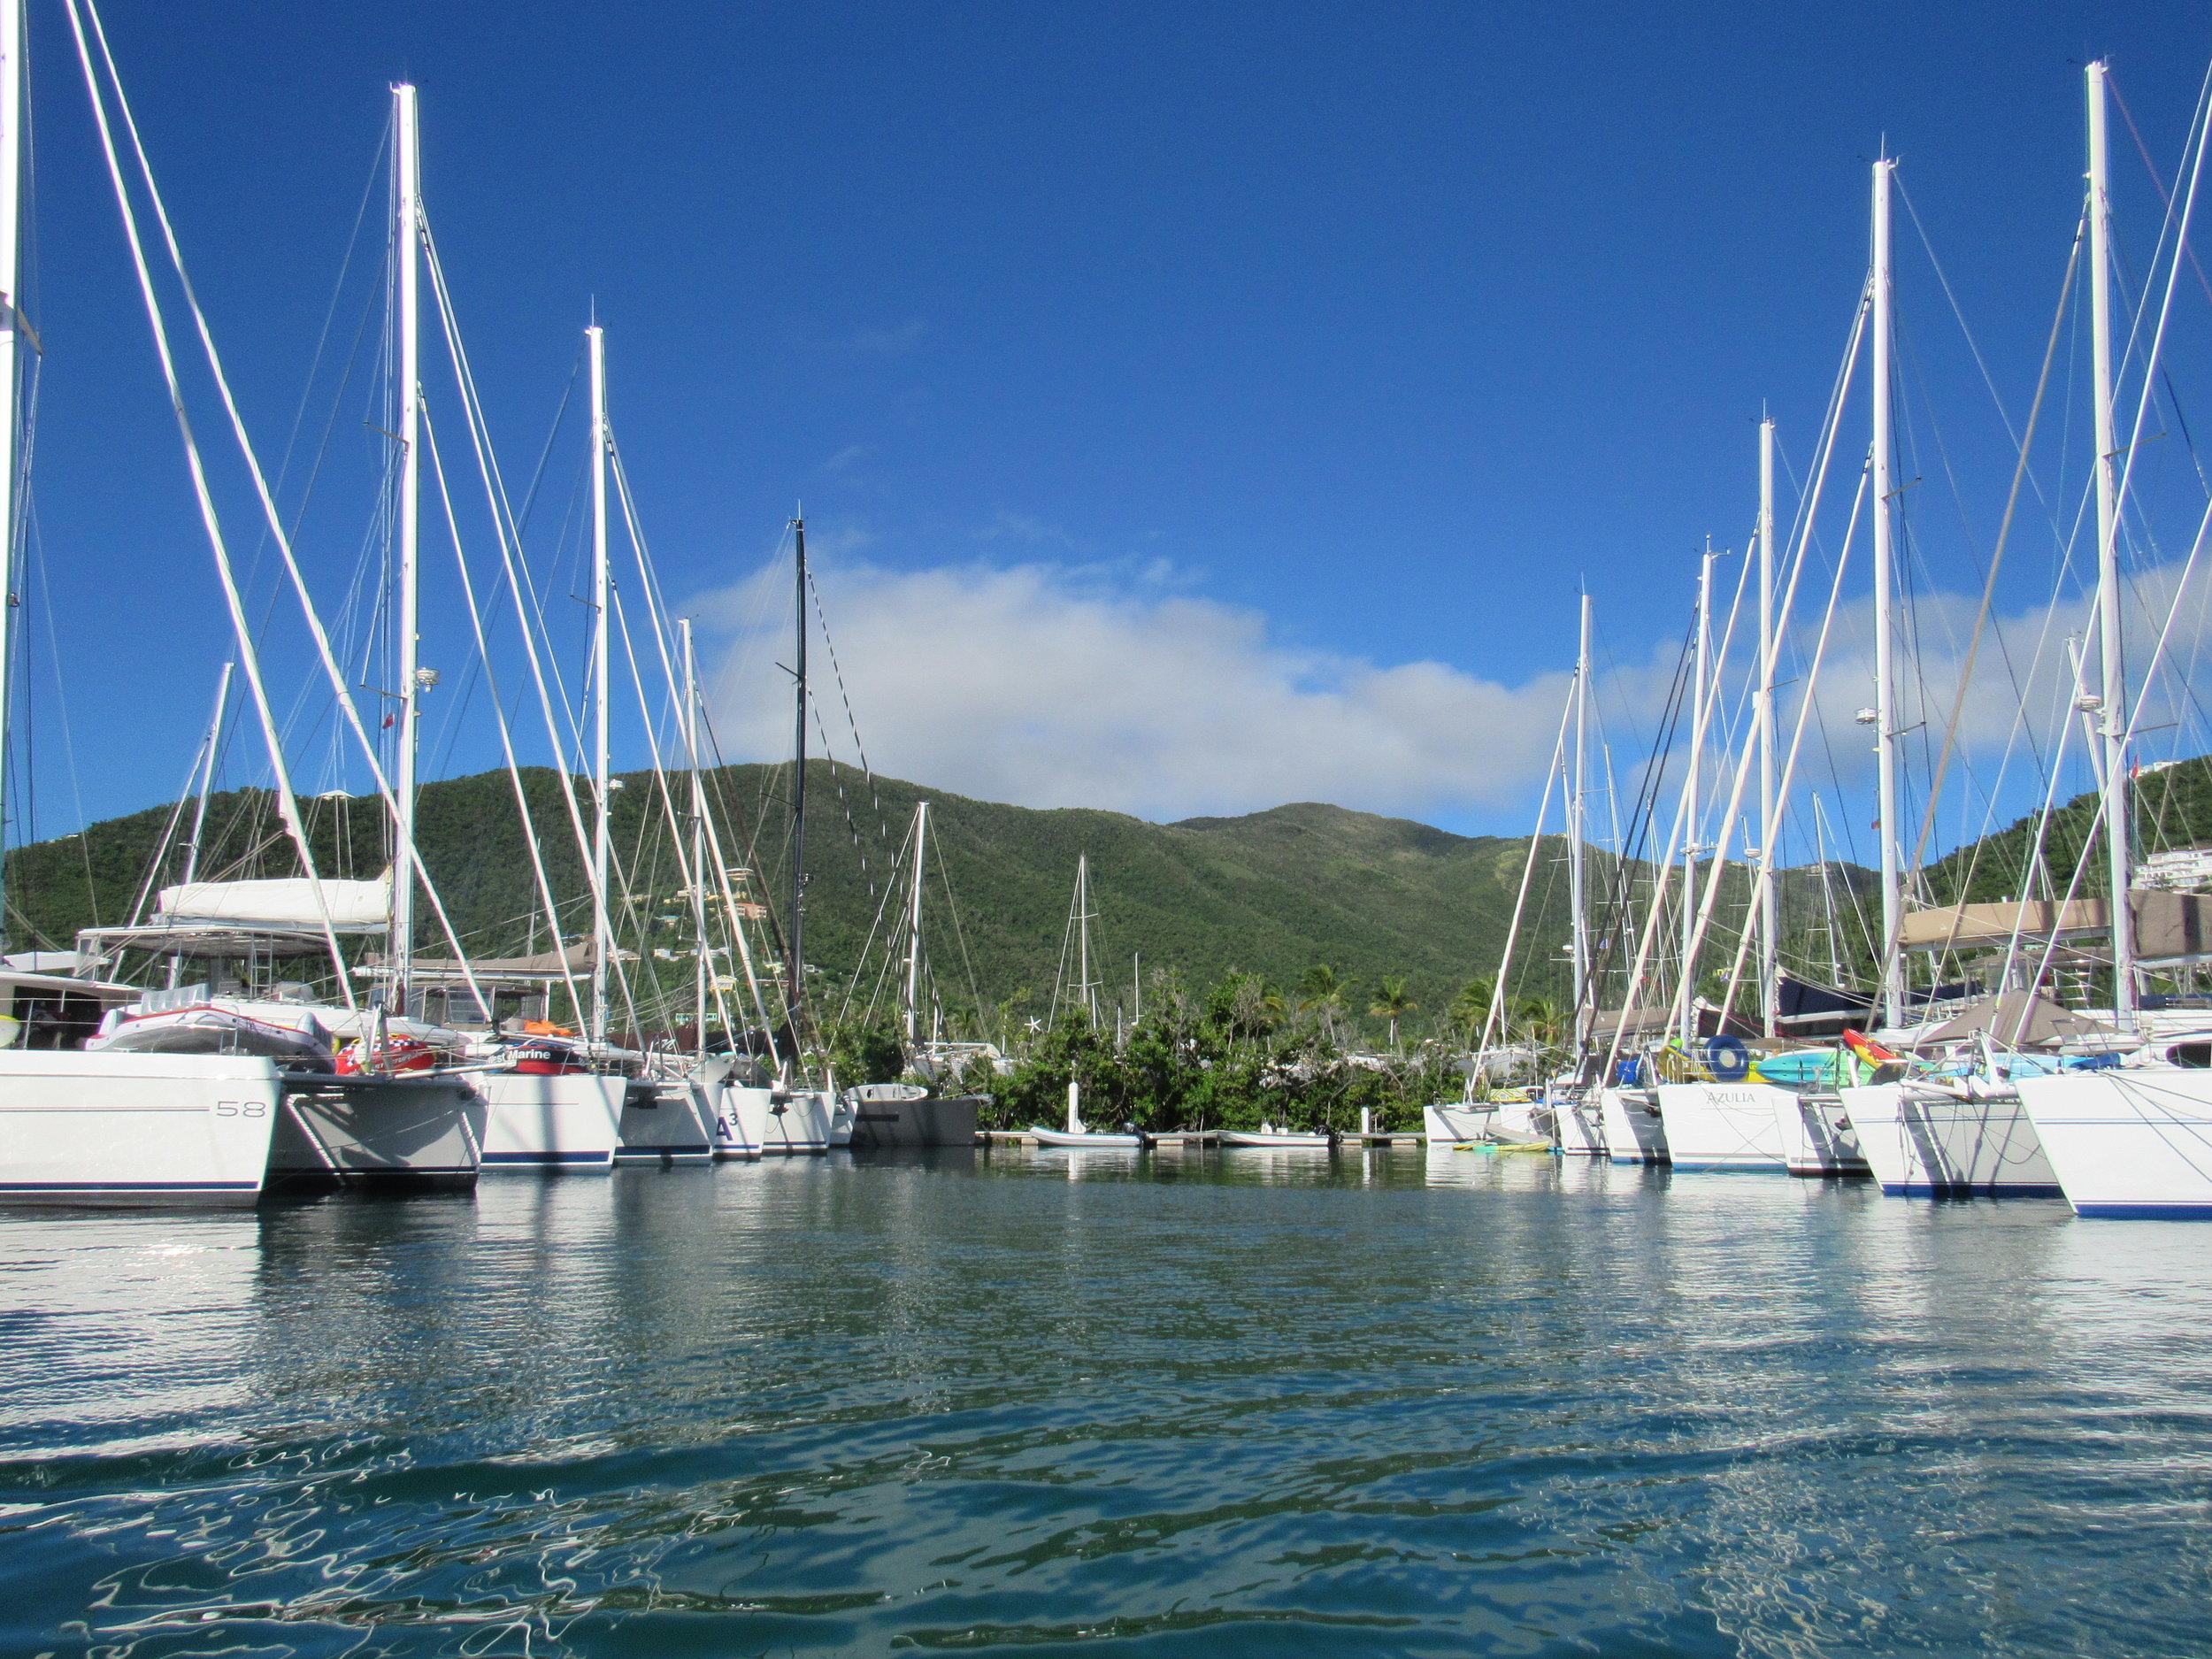 BVI Charter Yacht Show, Tortola, BVI